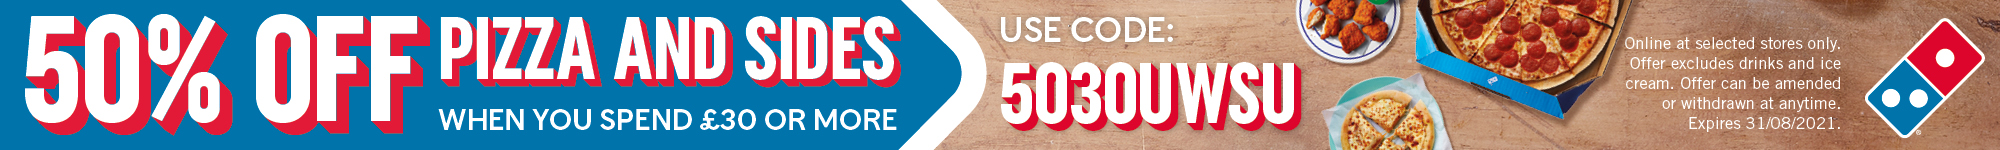 Pb30556 2000x150pxl 50 pizza student westminster uni web banner